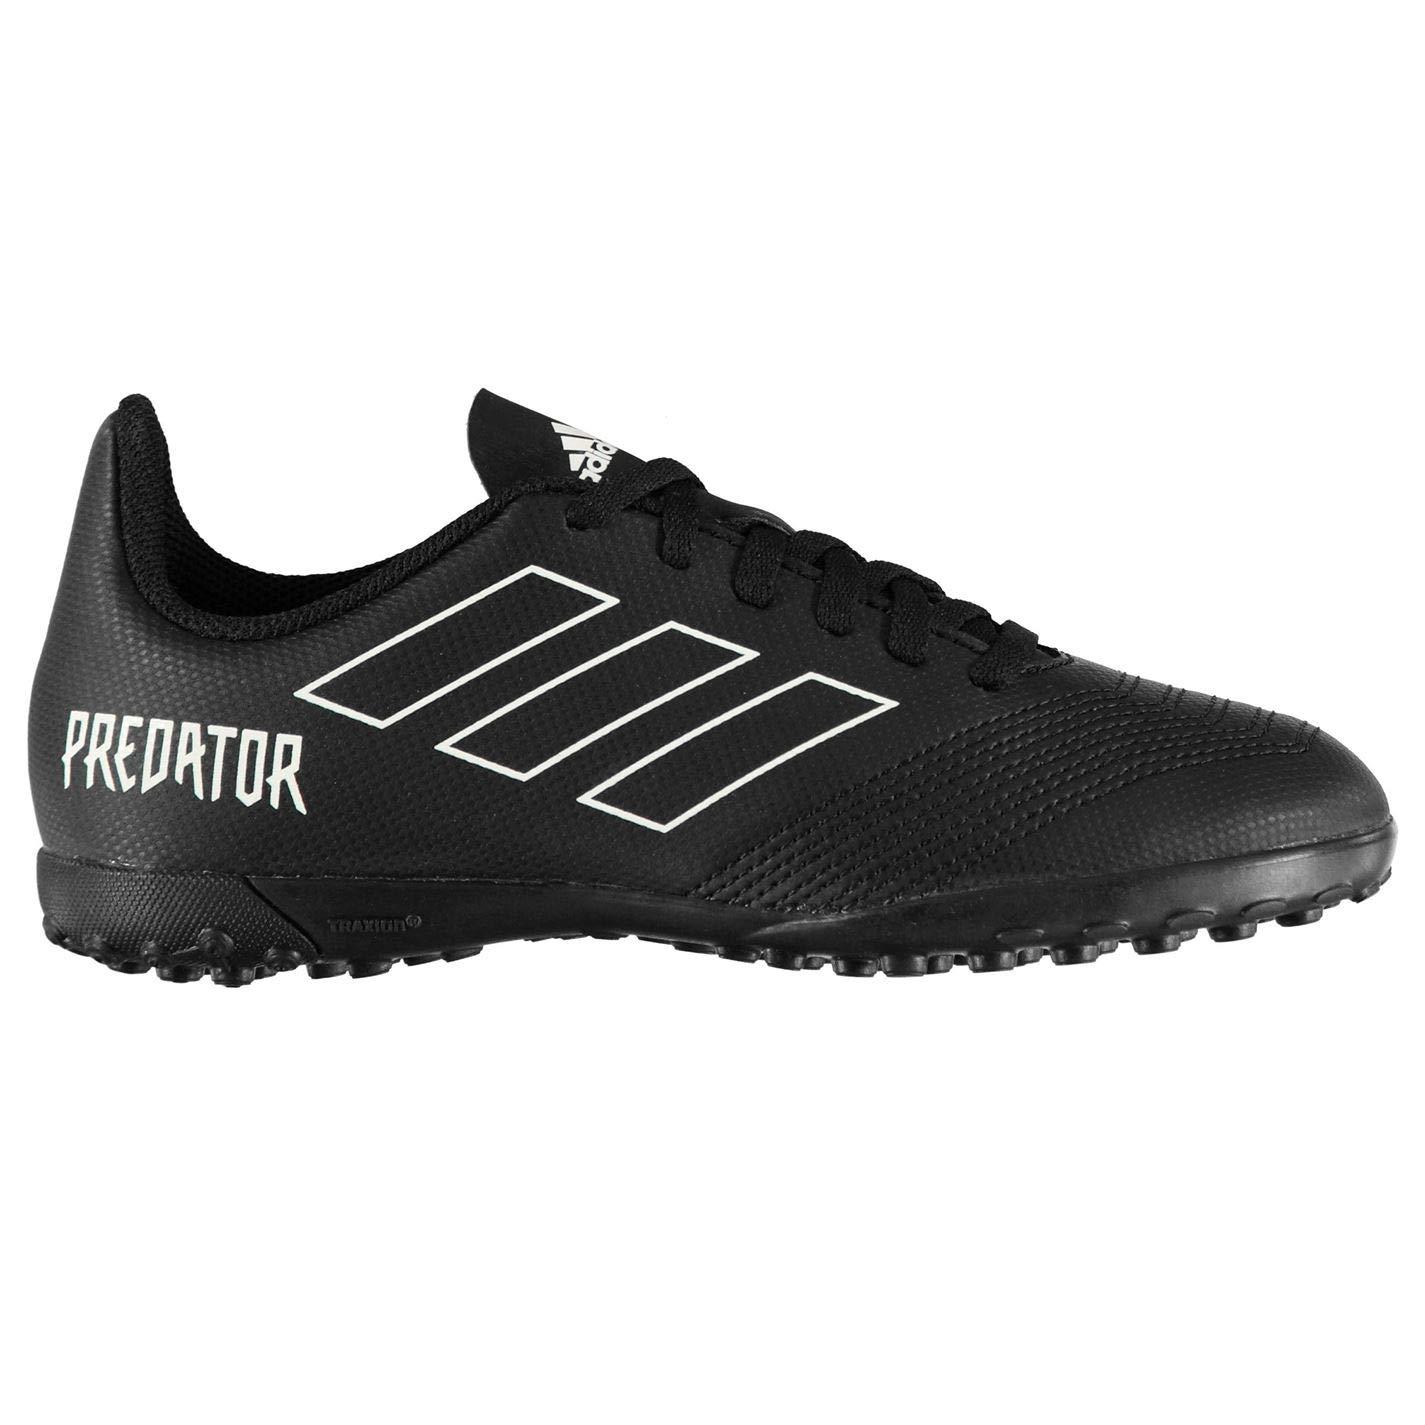 adidas Predator TF Tango 18.4 TF Predator J, Chaussures de Football Mixte Enfant 30 EU|Noir (Negbás 000) d6ab7c